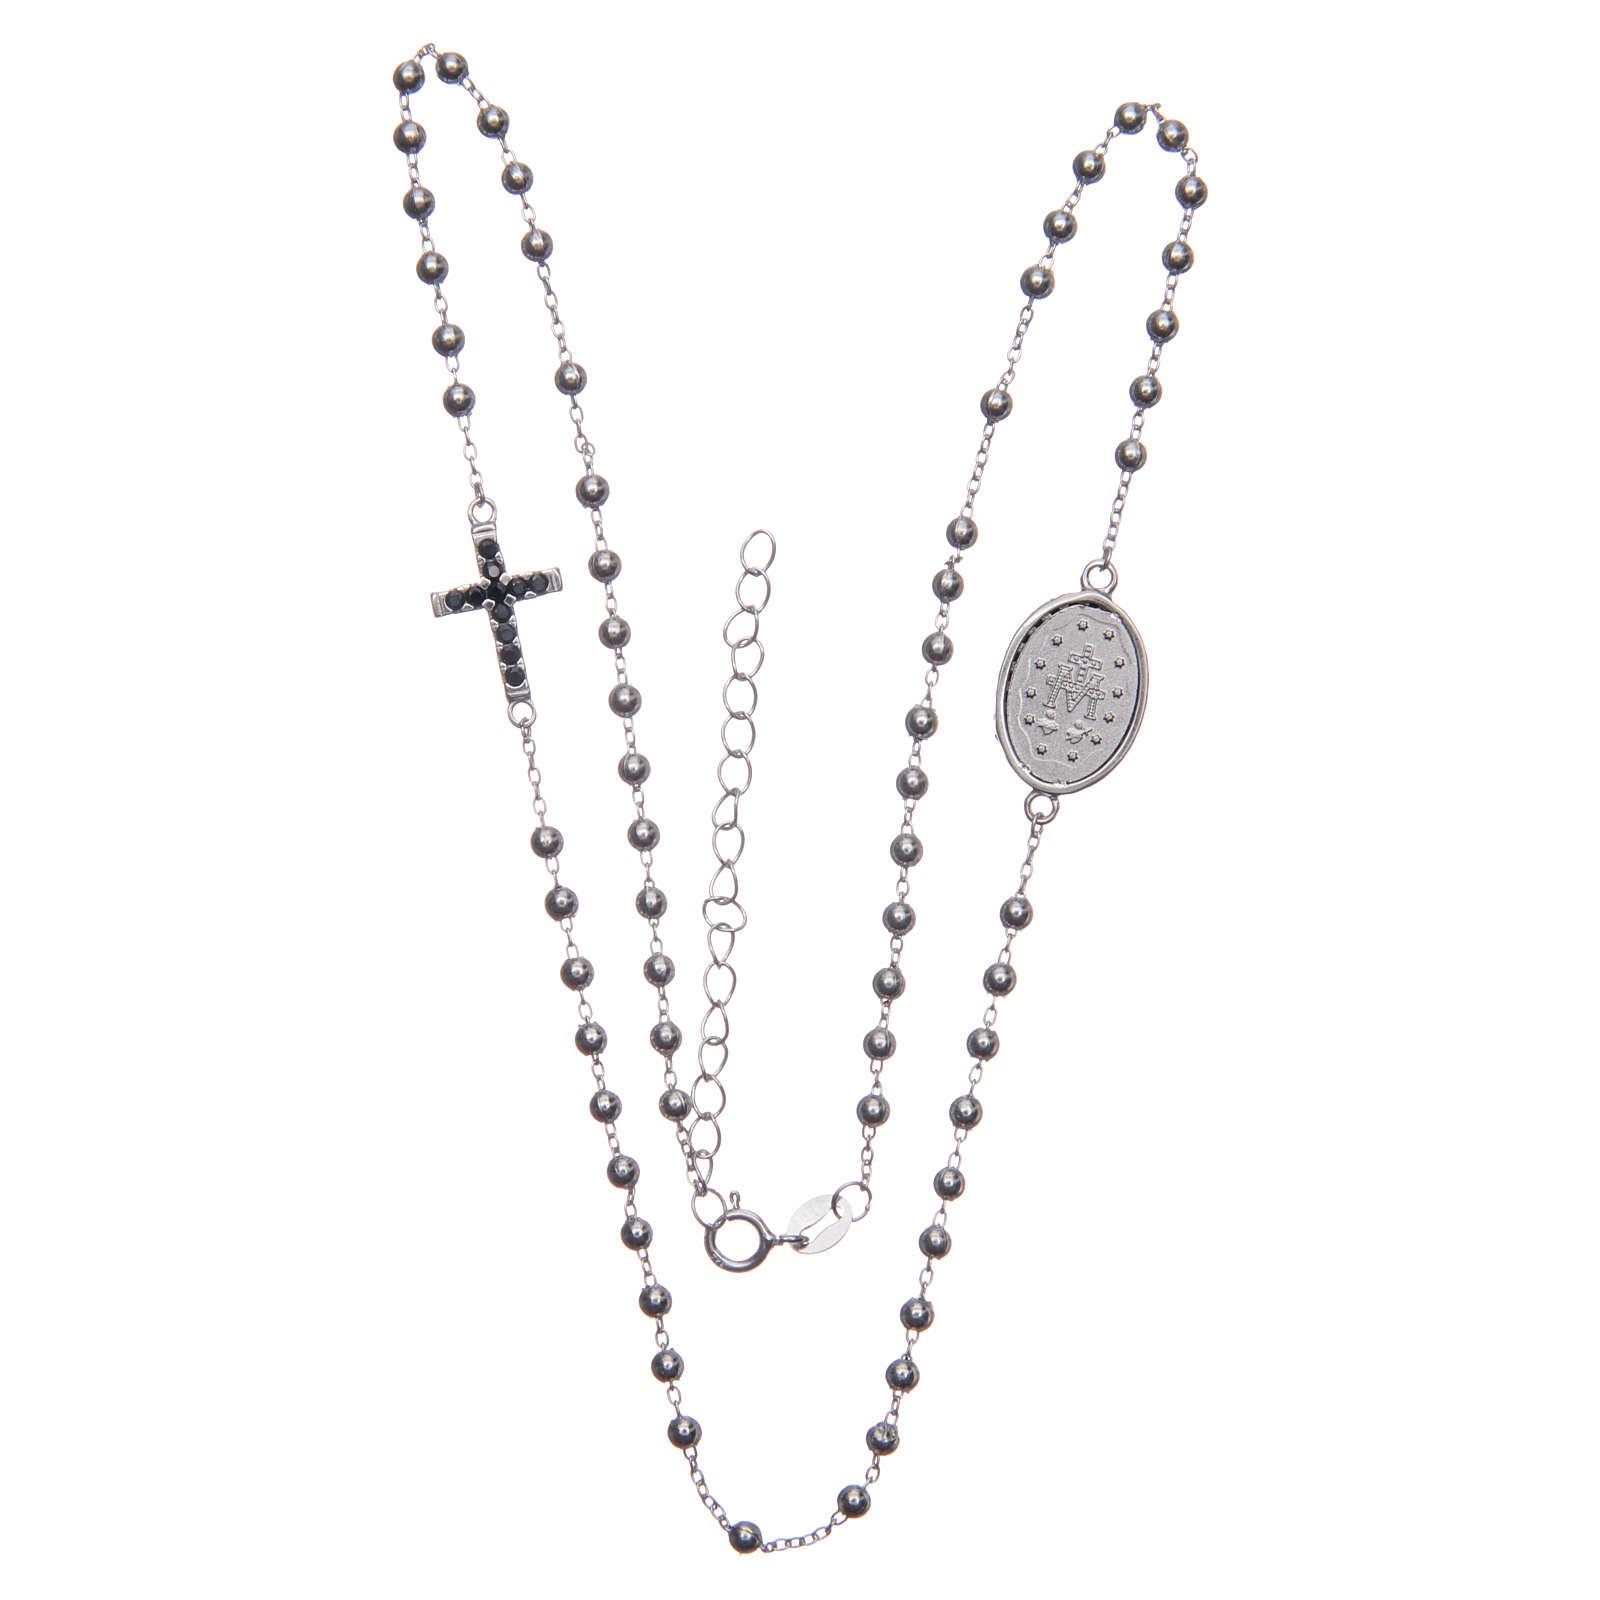 Rosario girocollo silver zirconi neri argento 925 4